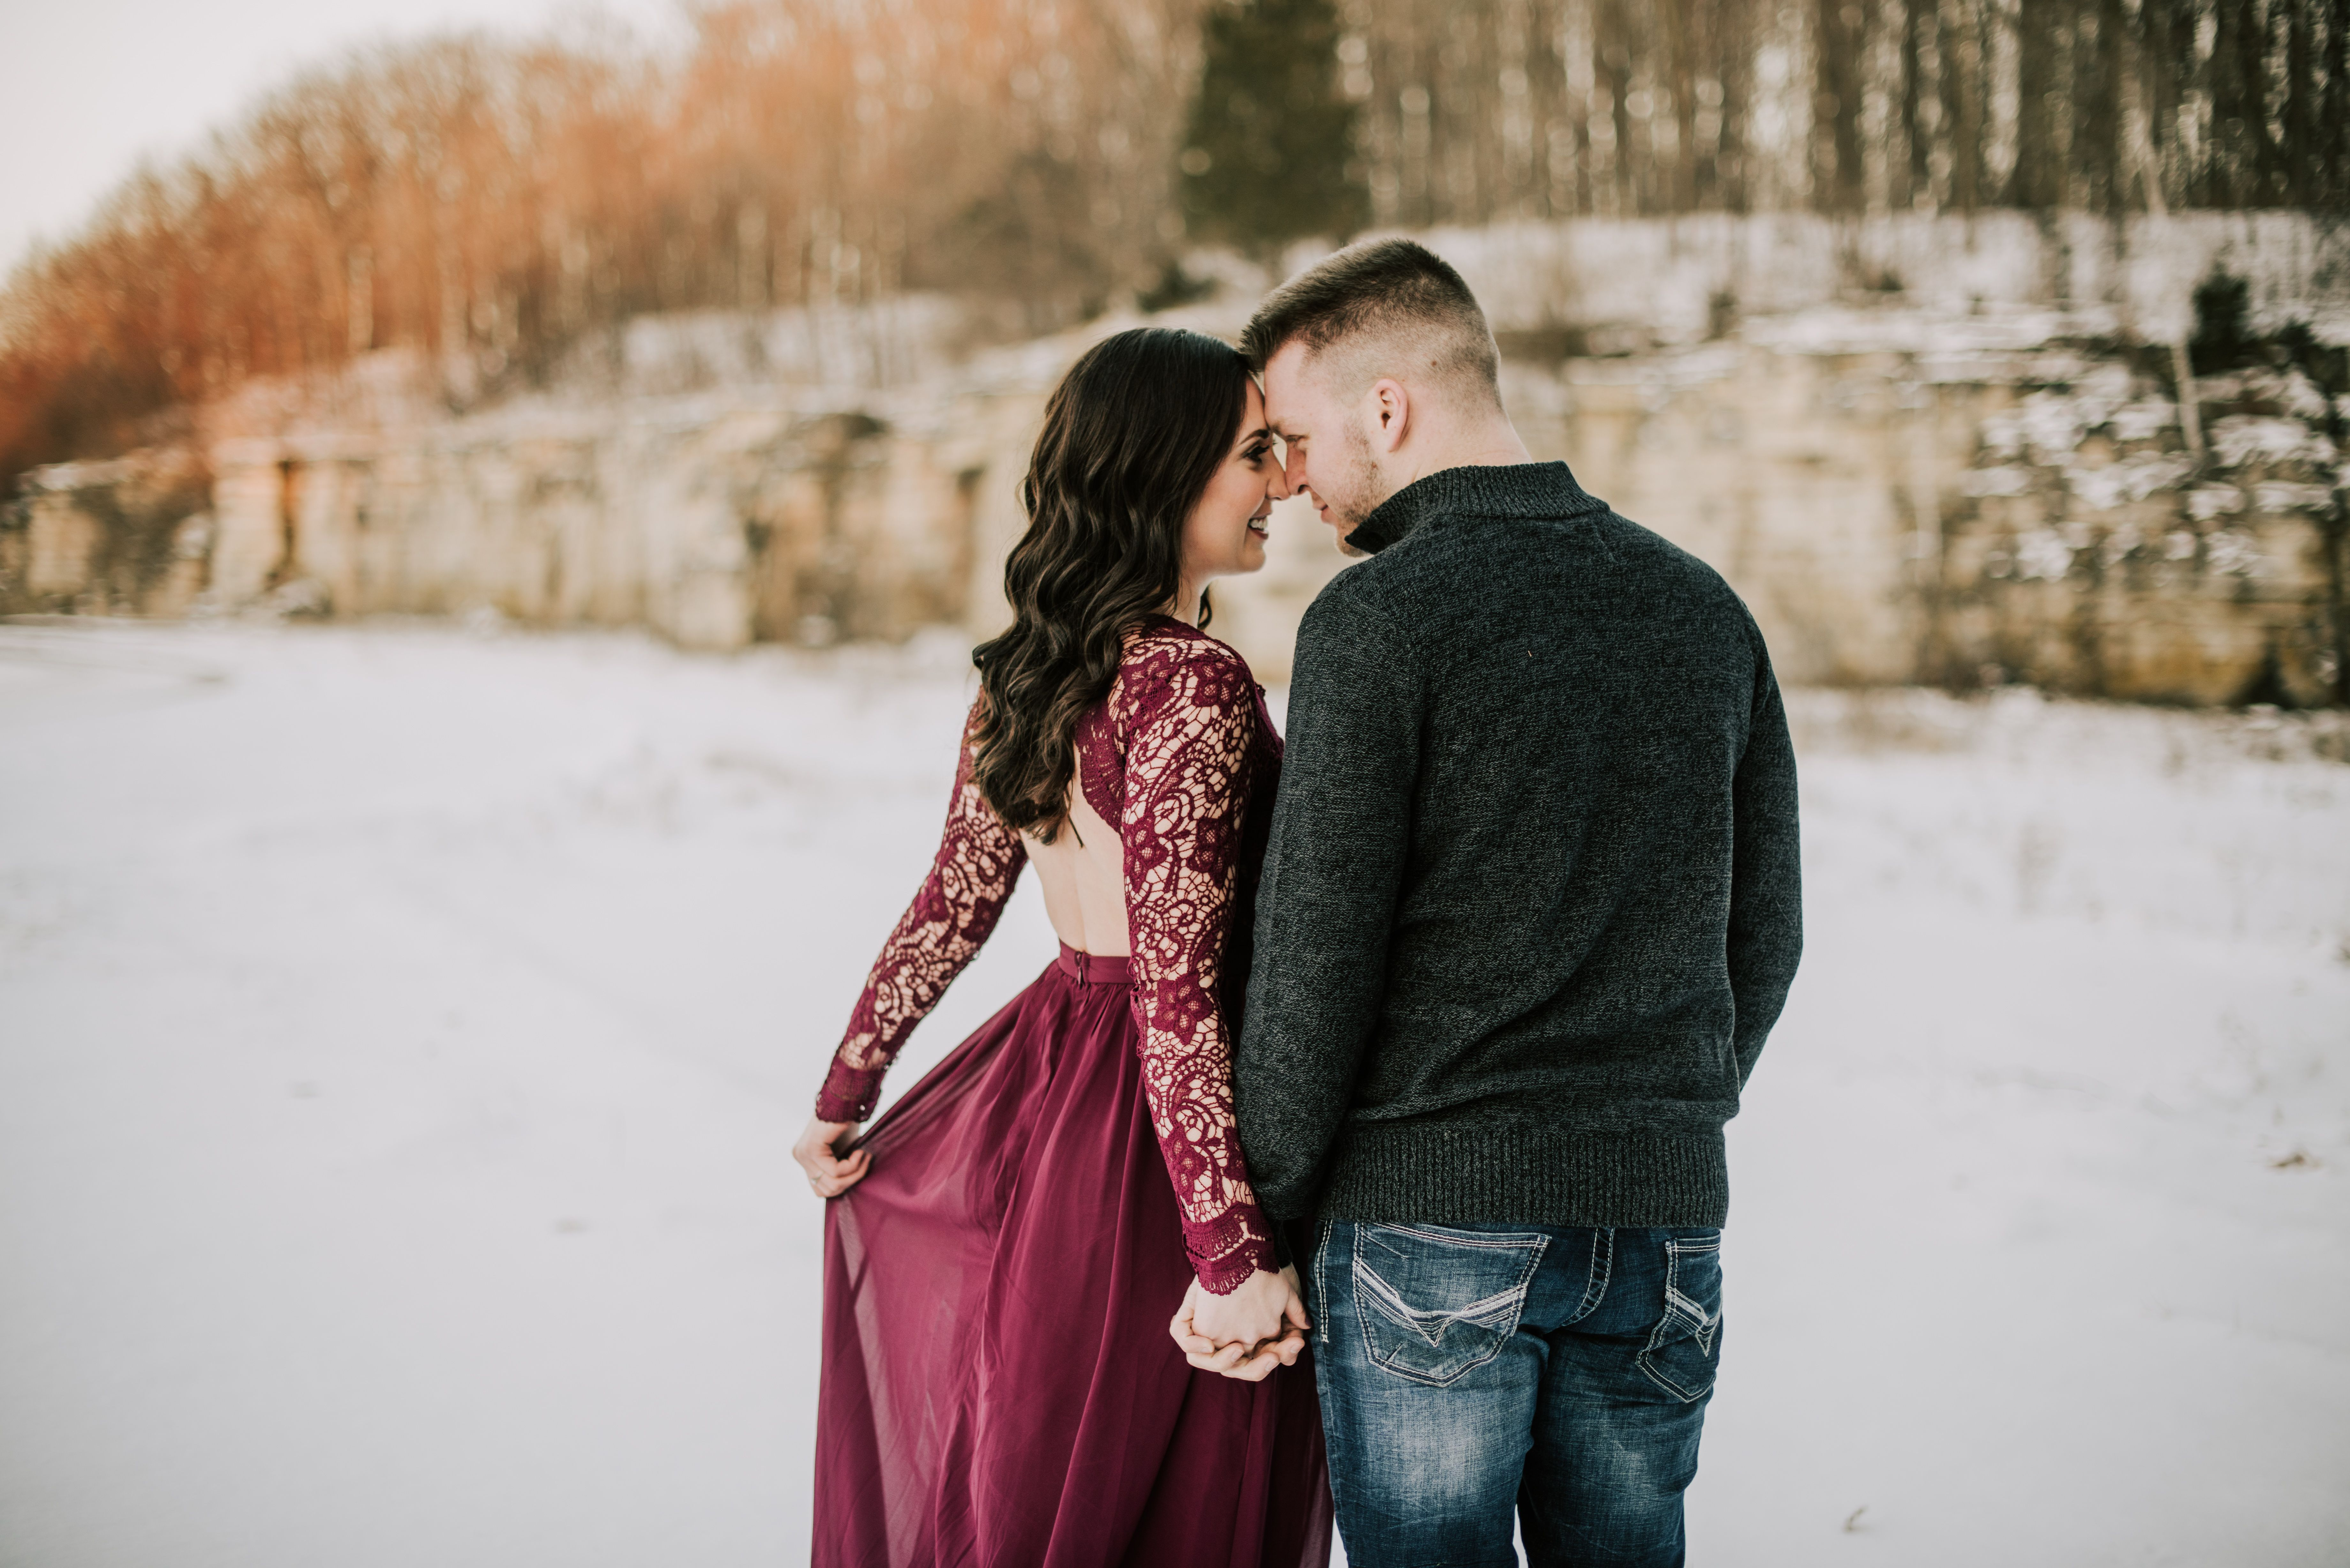 Awaken My Love Dusty Lavender Long Sleeve Lace Maxi Dress Engagement Photo Dress Engagement Picture Outfits Dresses For Engagement Pictures [ 4912 x 7360 Pixel ]